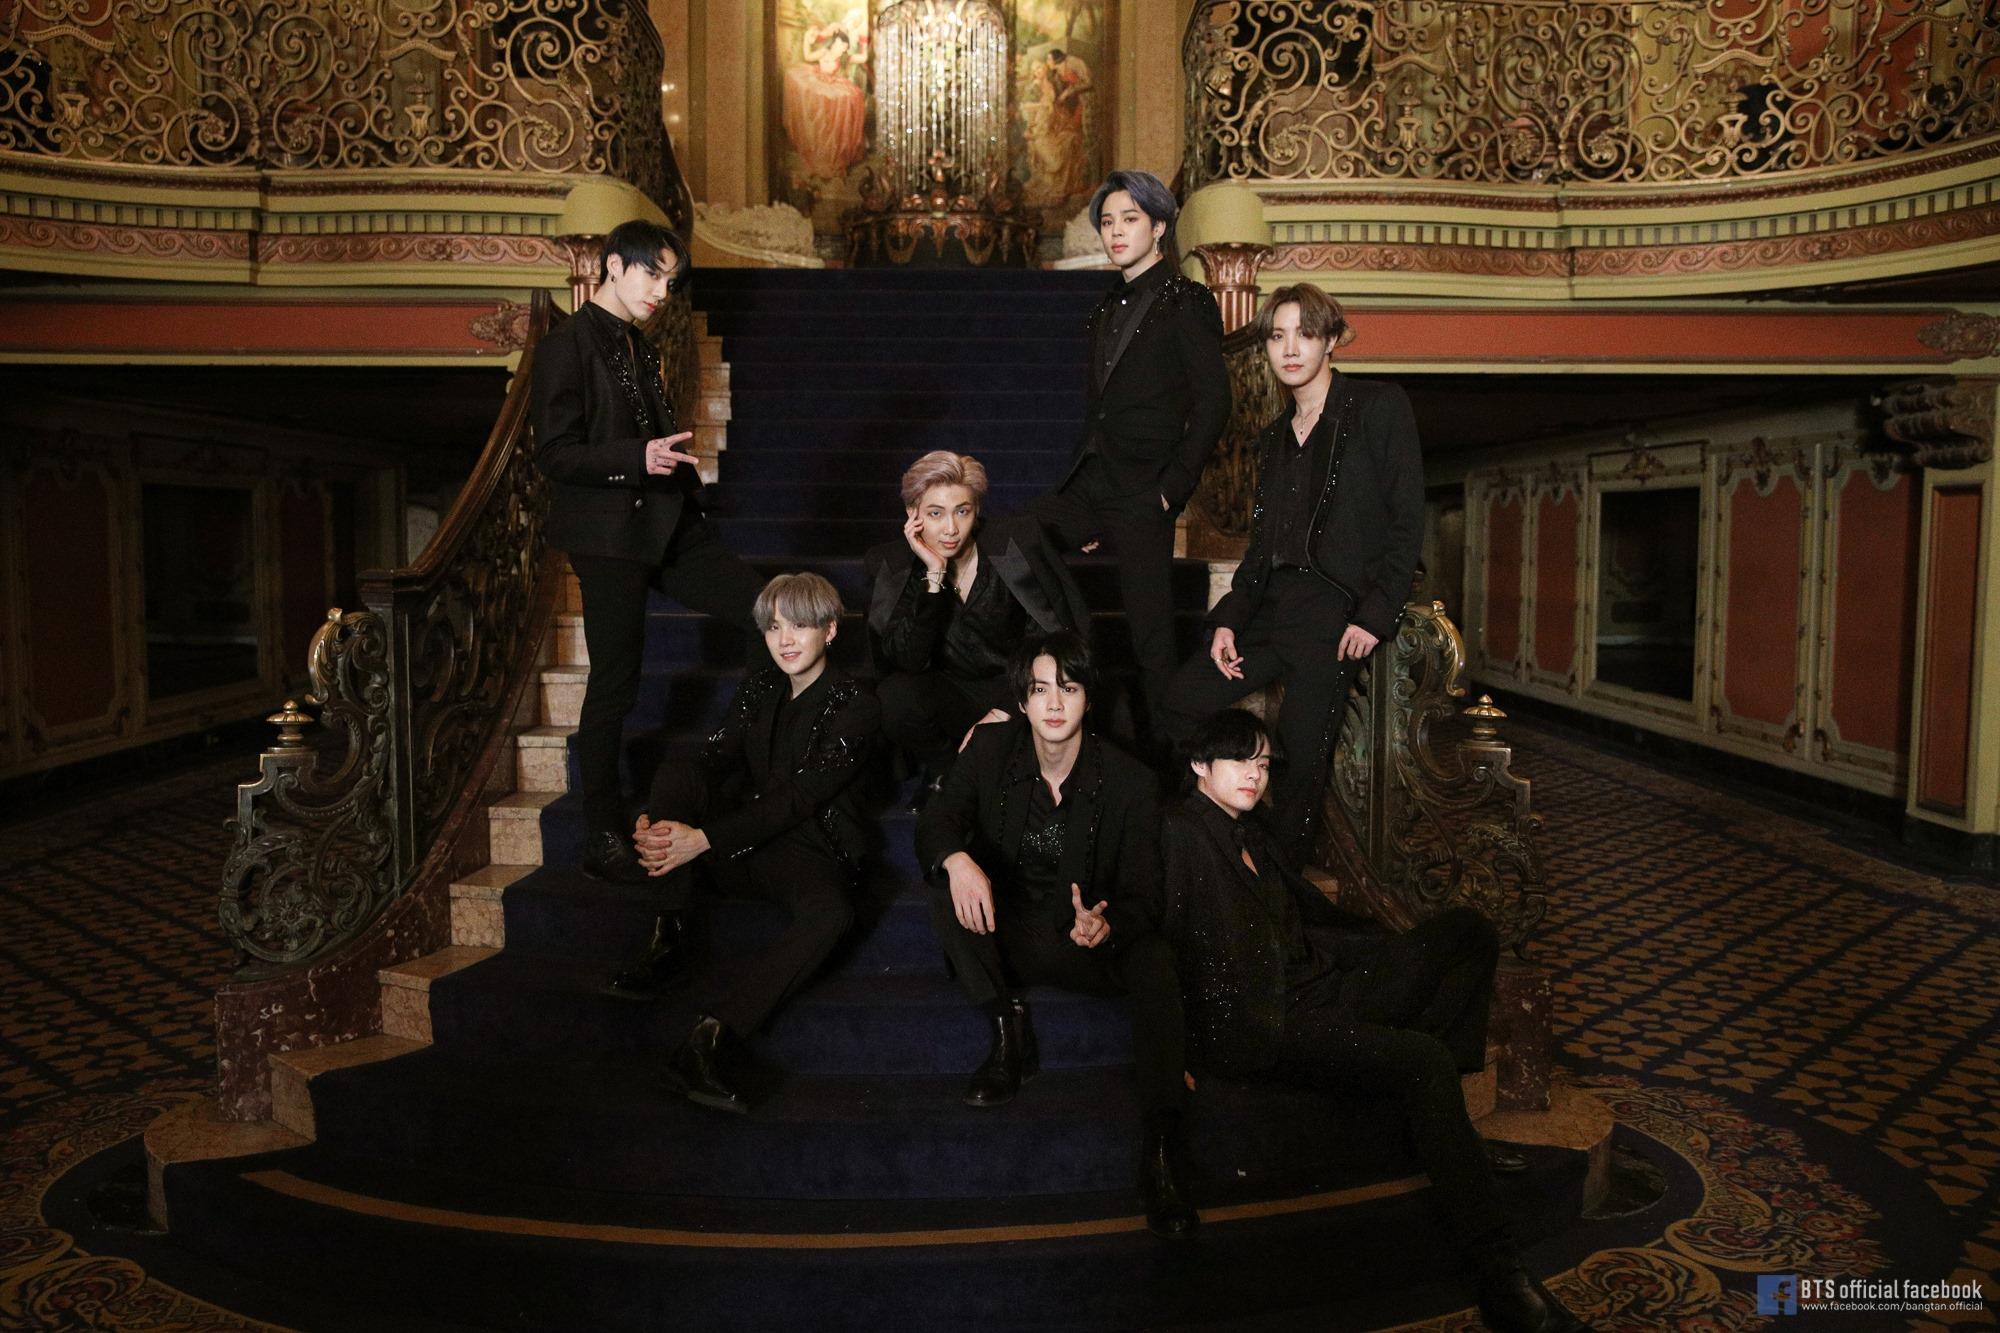 [Picture/FB] BTS 'Black Swan' Official MV Photo Sketch ...